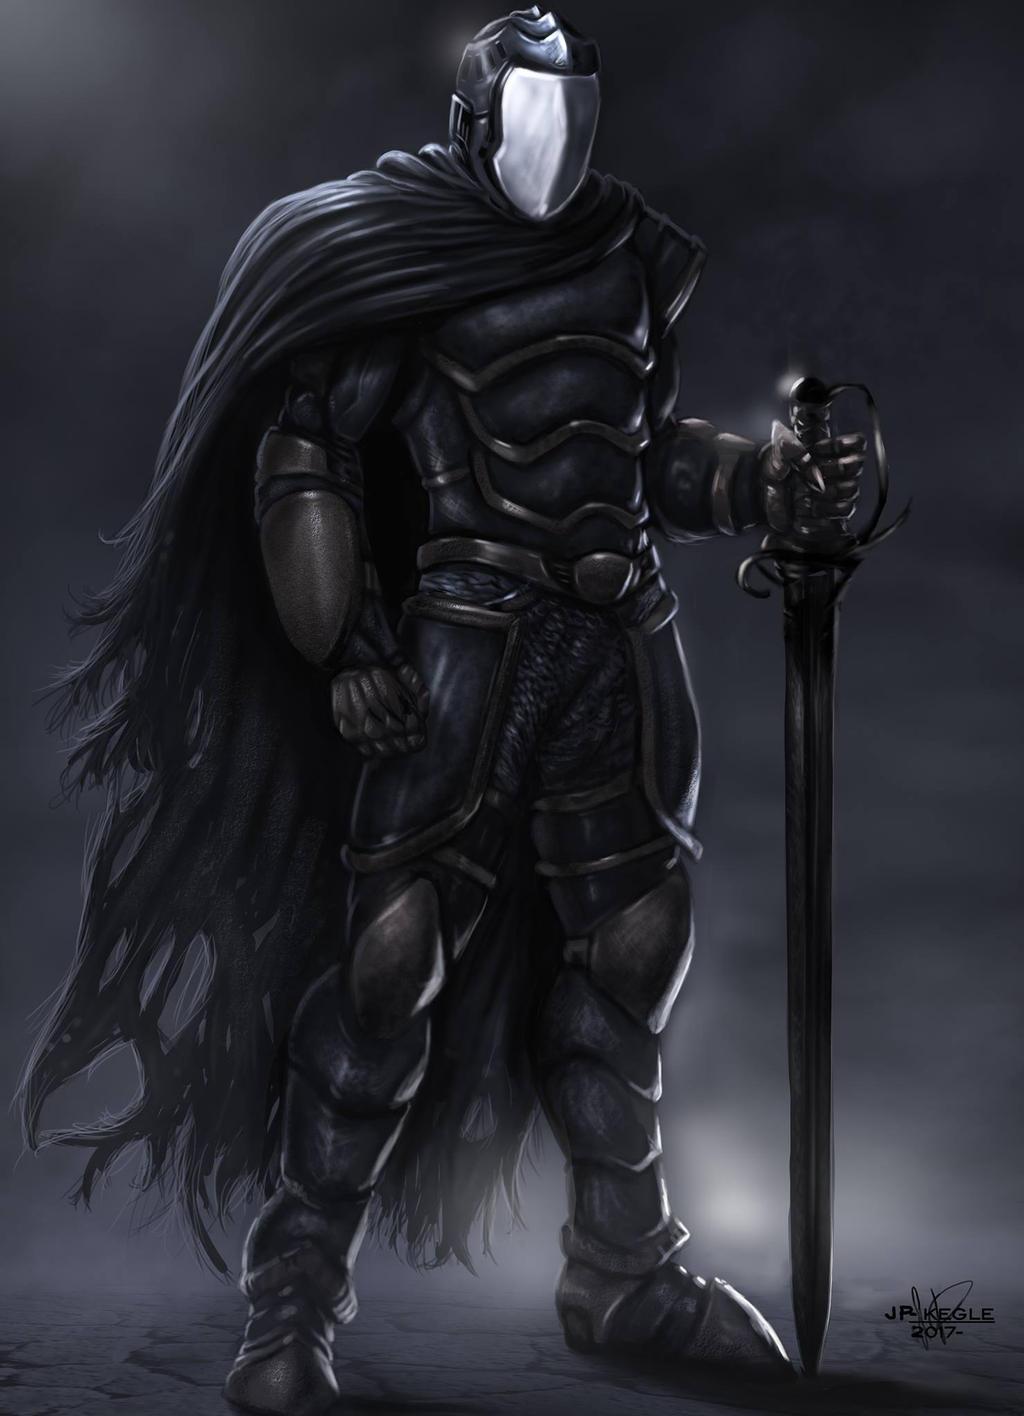 The Shadow Knight by JPKegle